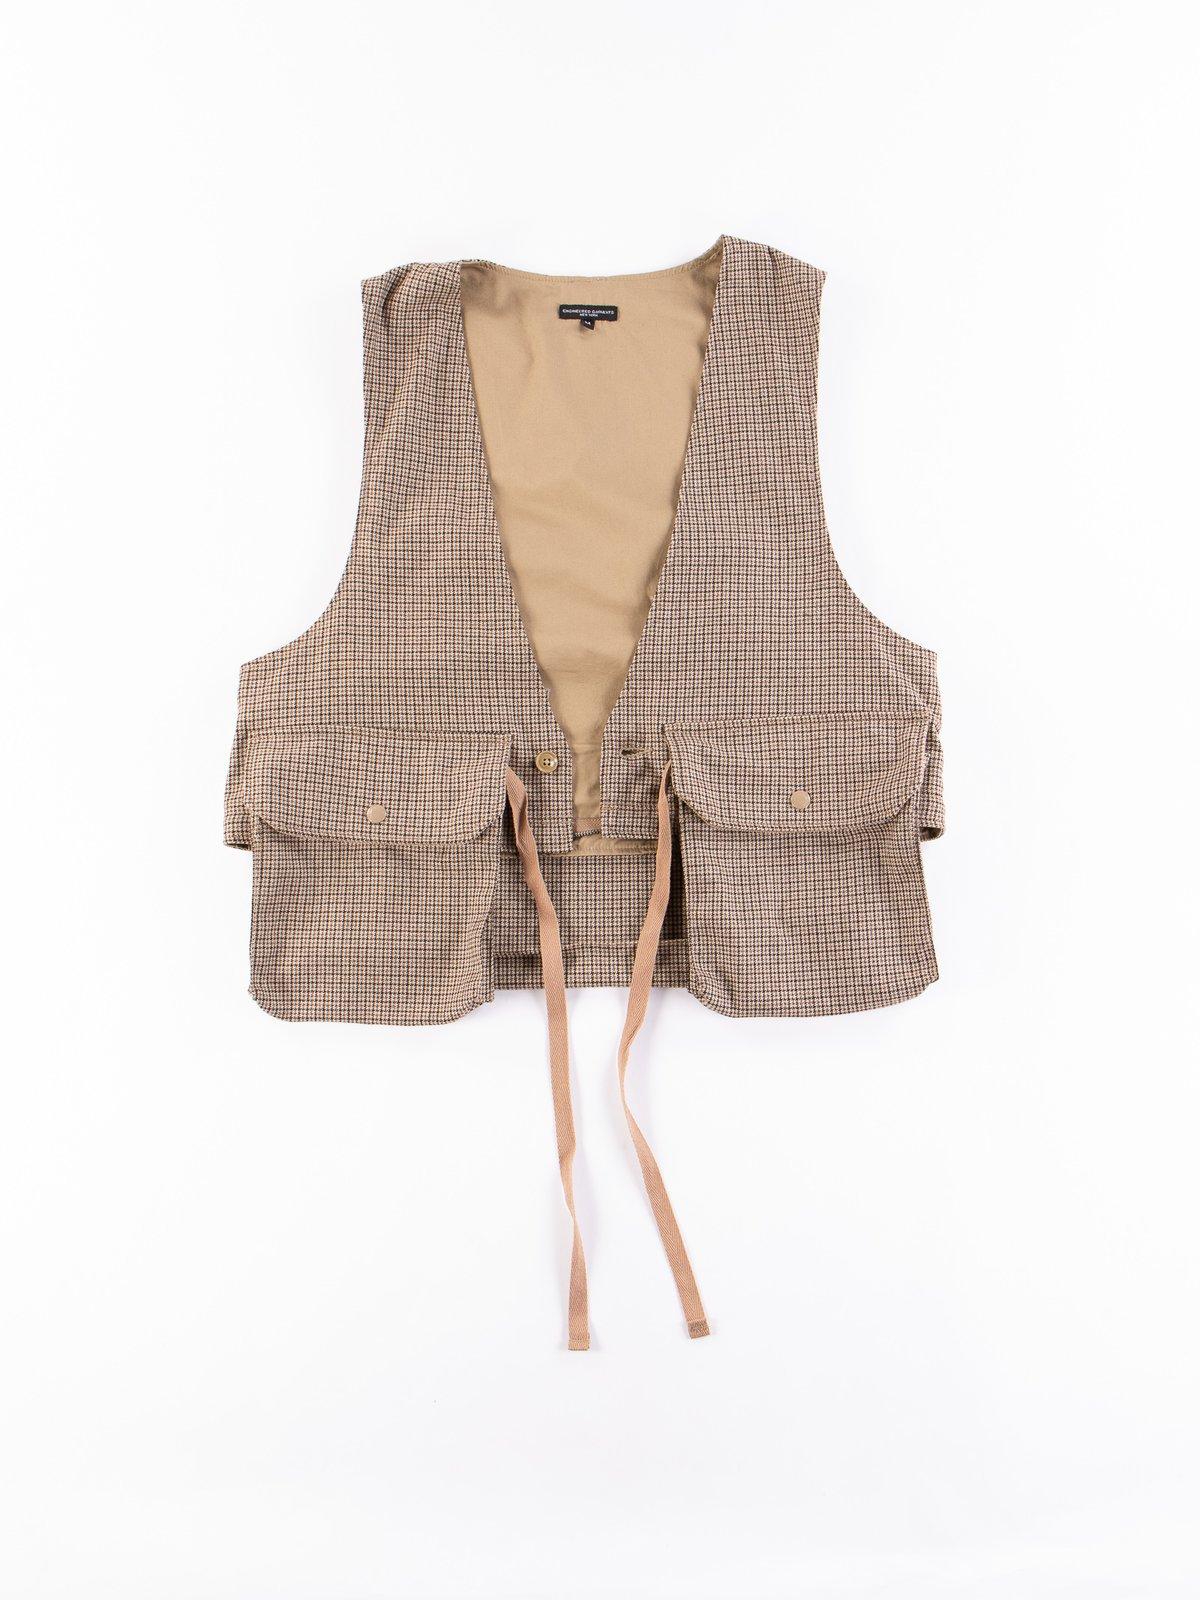 Brown Wool Poly Gunclub Check Long Fowl Vest - Image 9